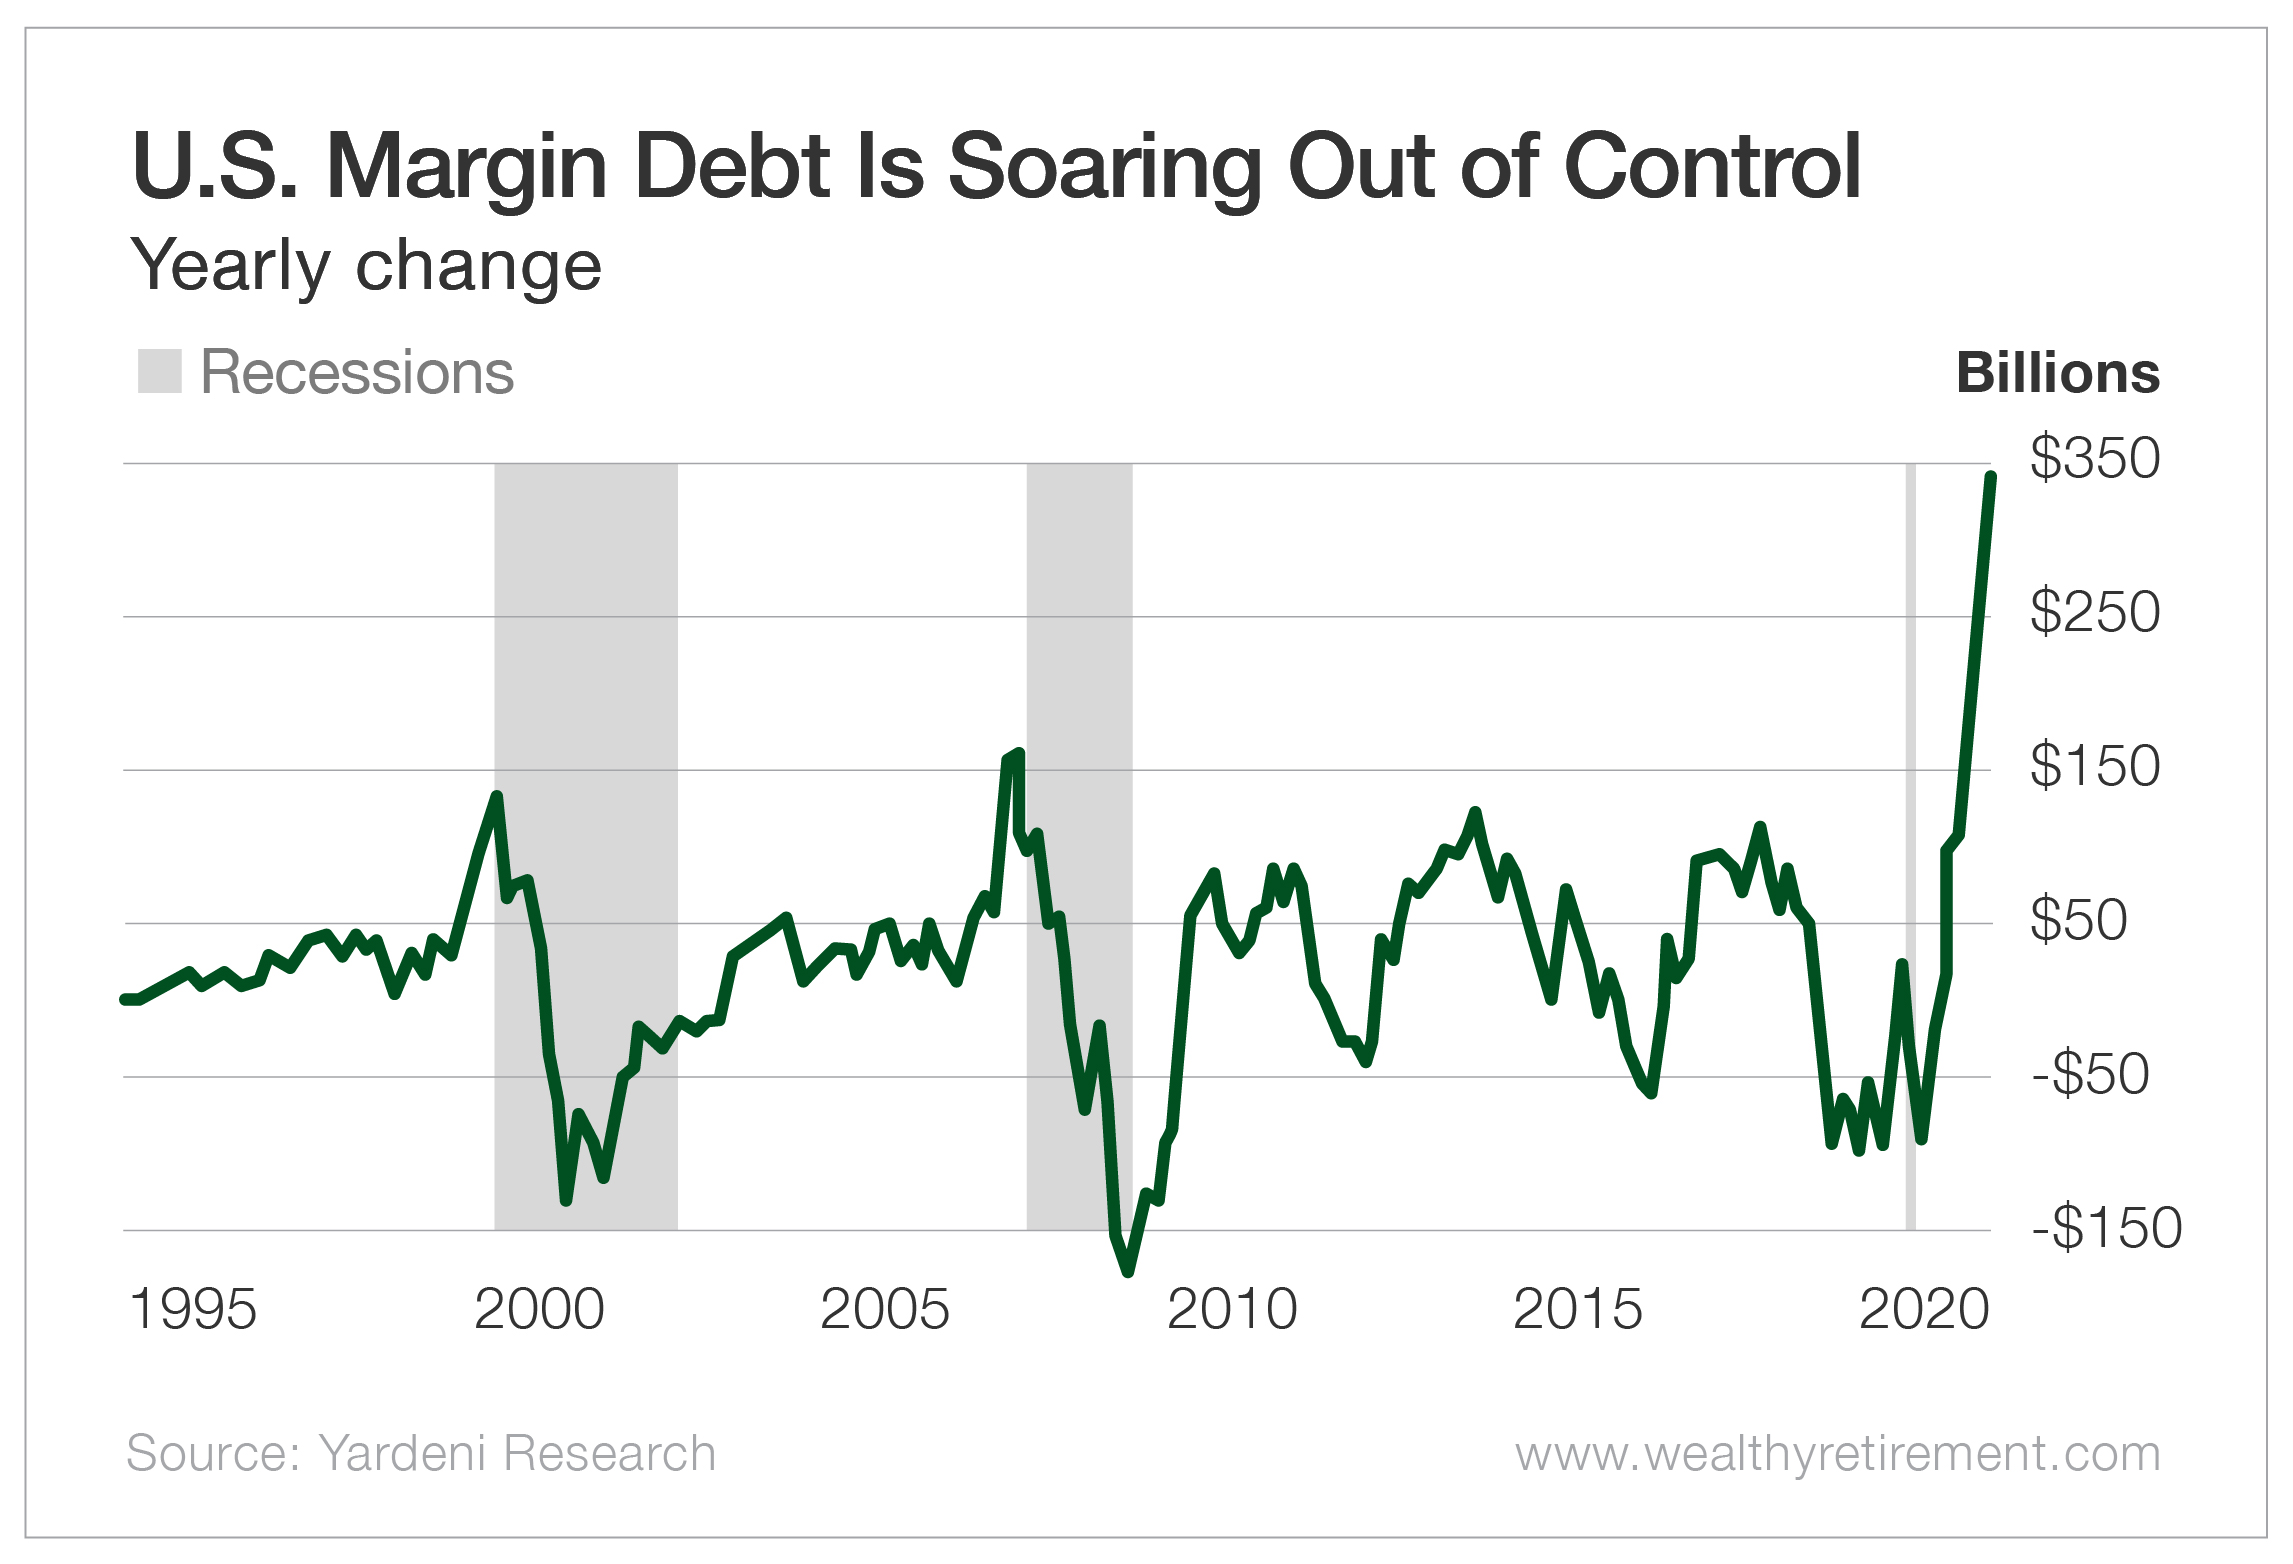 U.S. Margin Debt is Soaring Out of Control